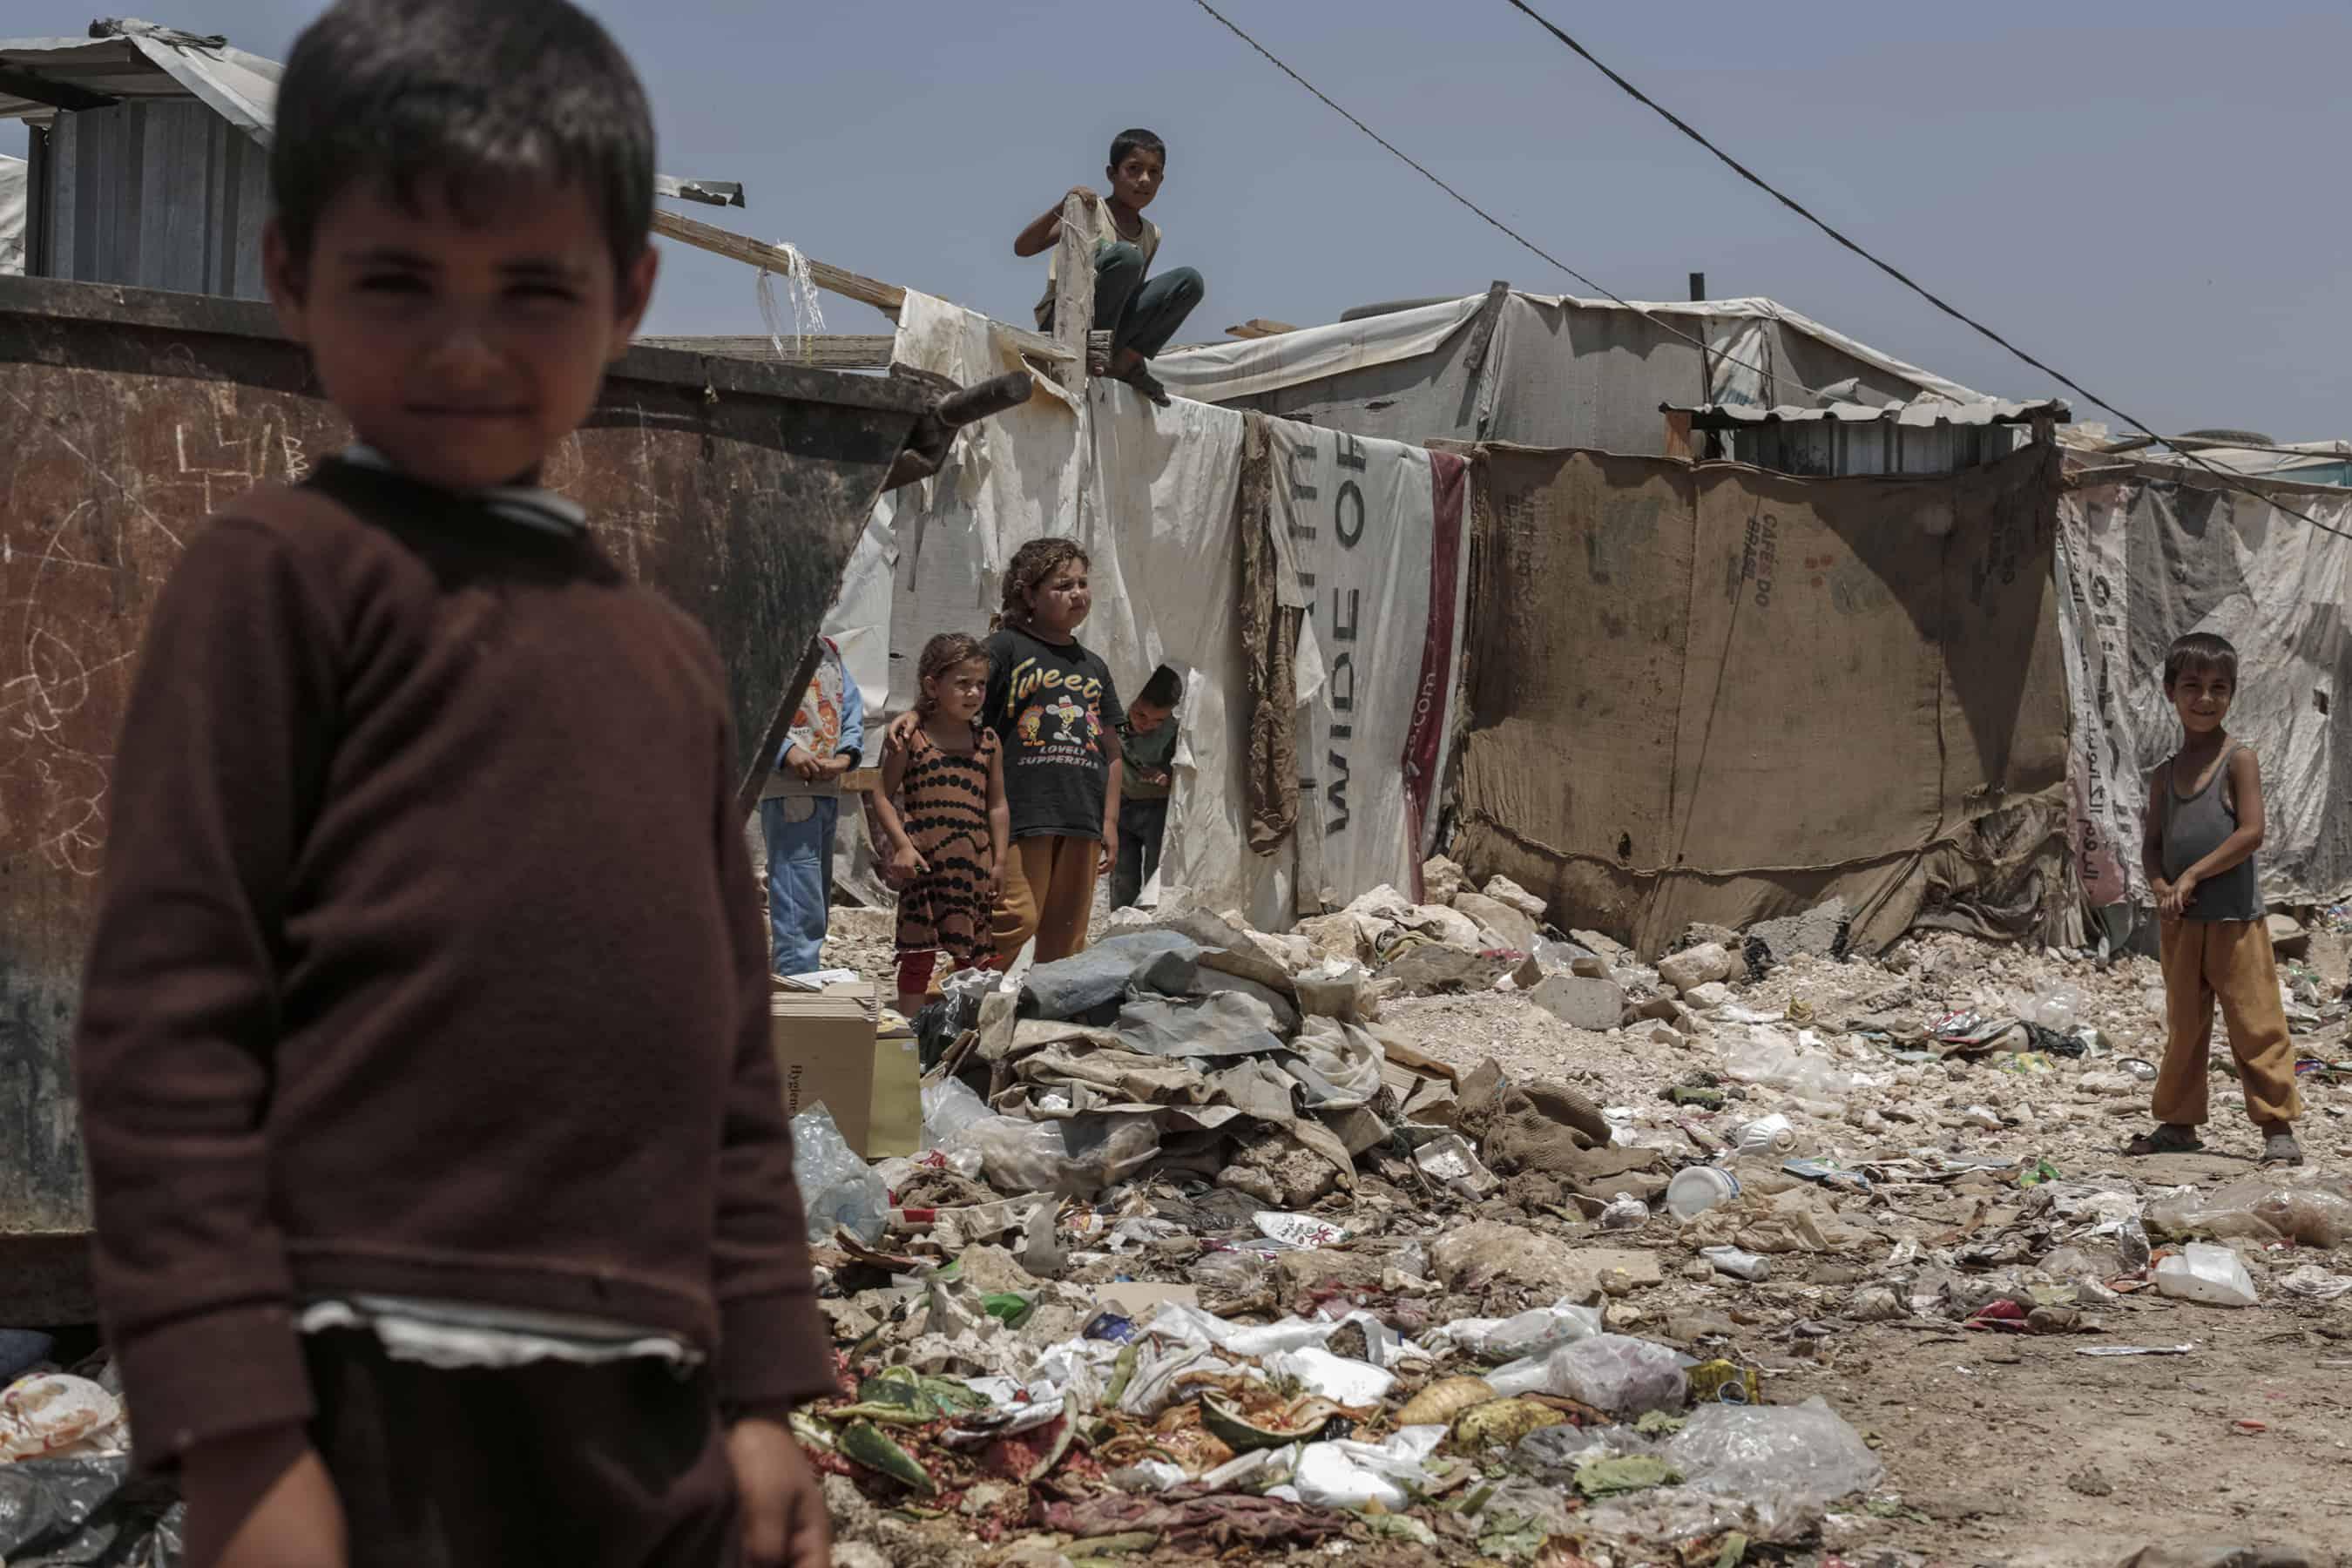 Children play amid garbage at an informal Syrian refugee settlement near Zahle, Lebanon.